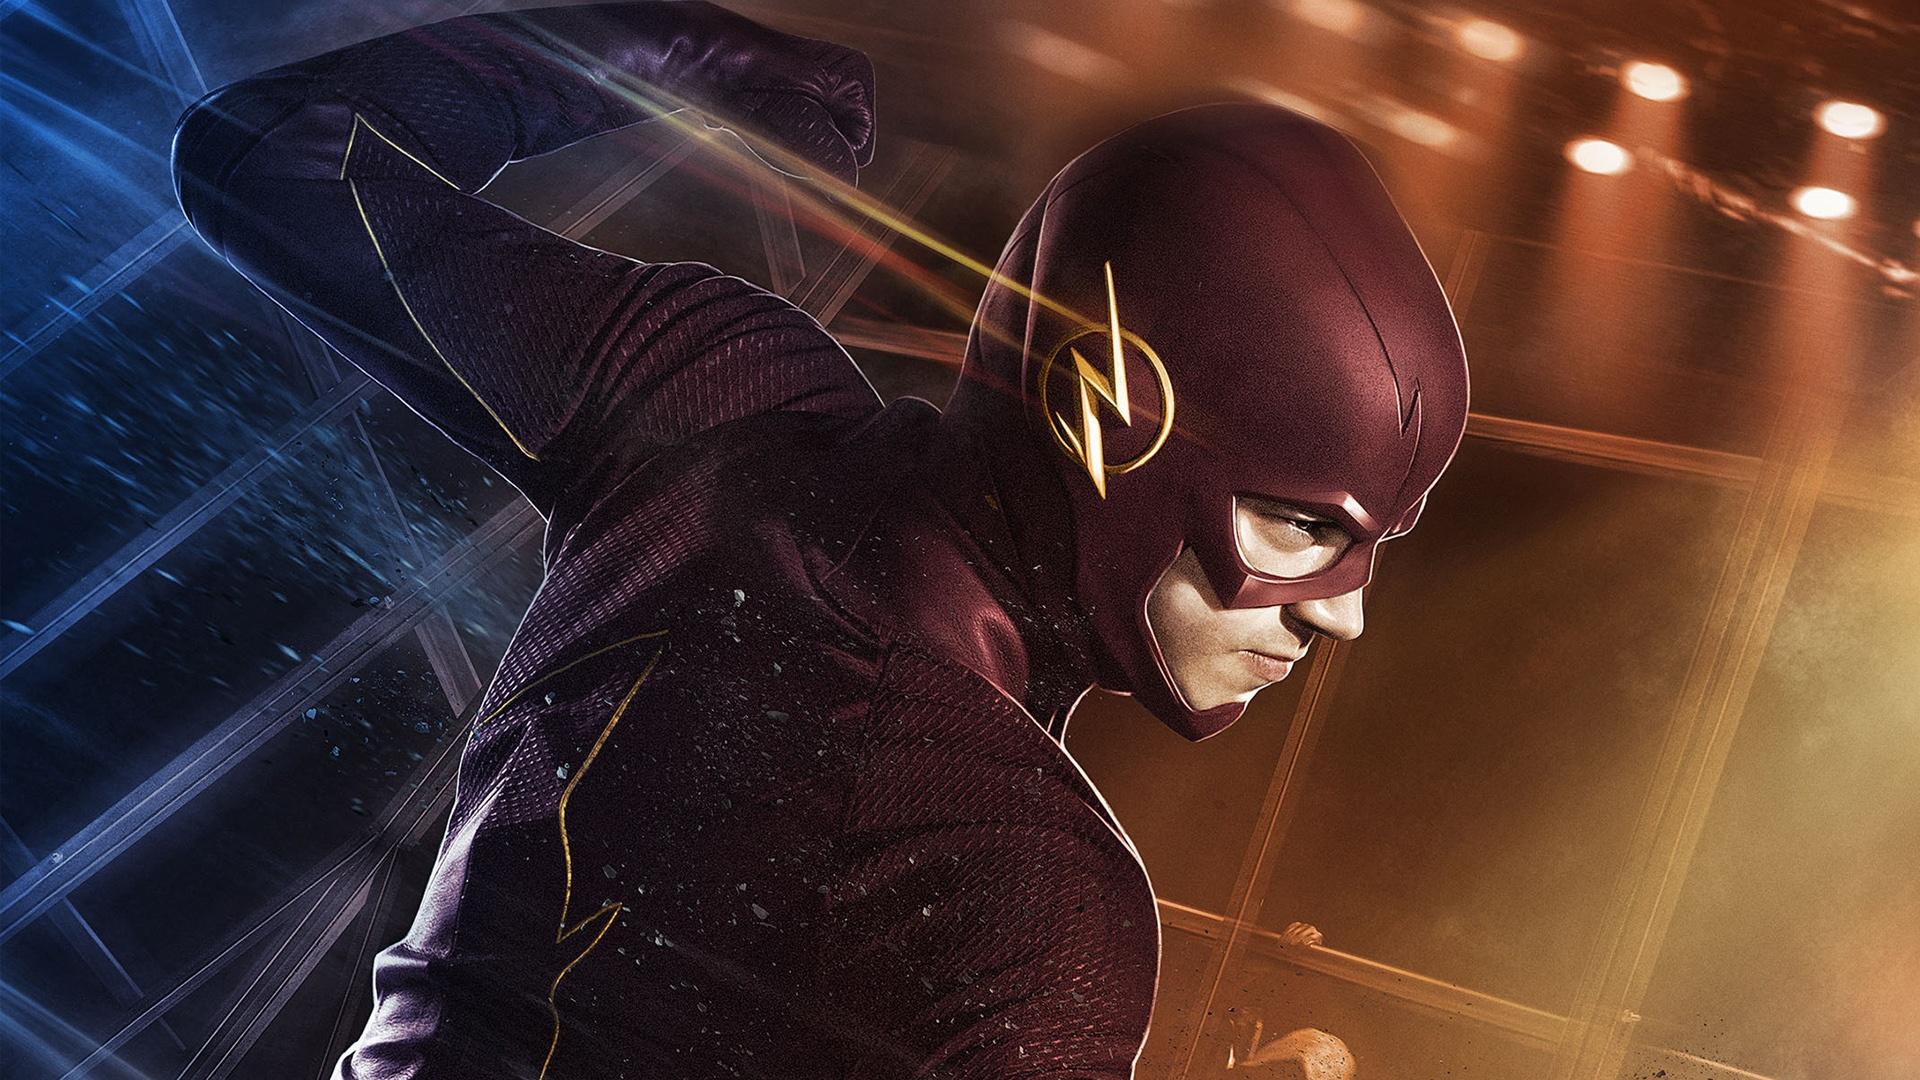 Fondos de pantalla de Barry Allen es The Flash tamao 1024x768 1920x1080